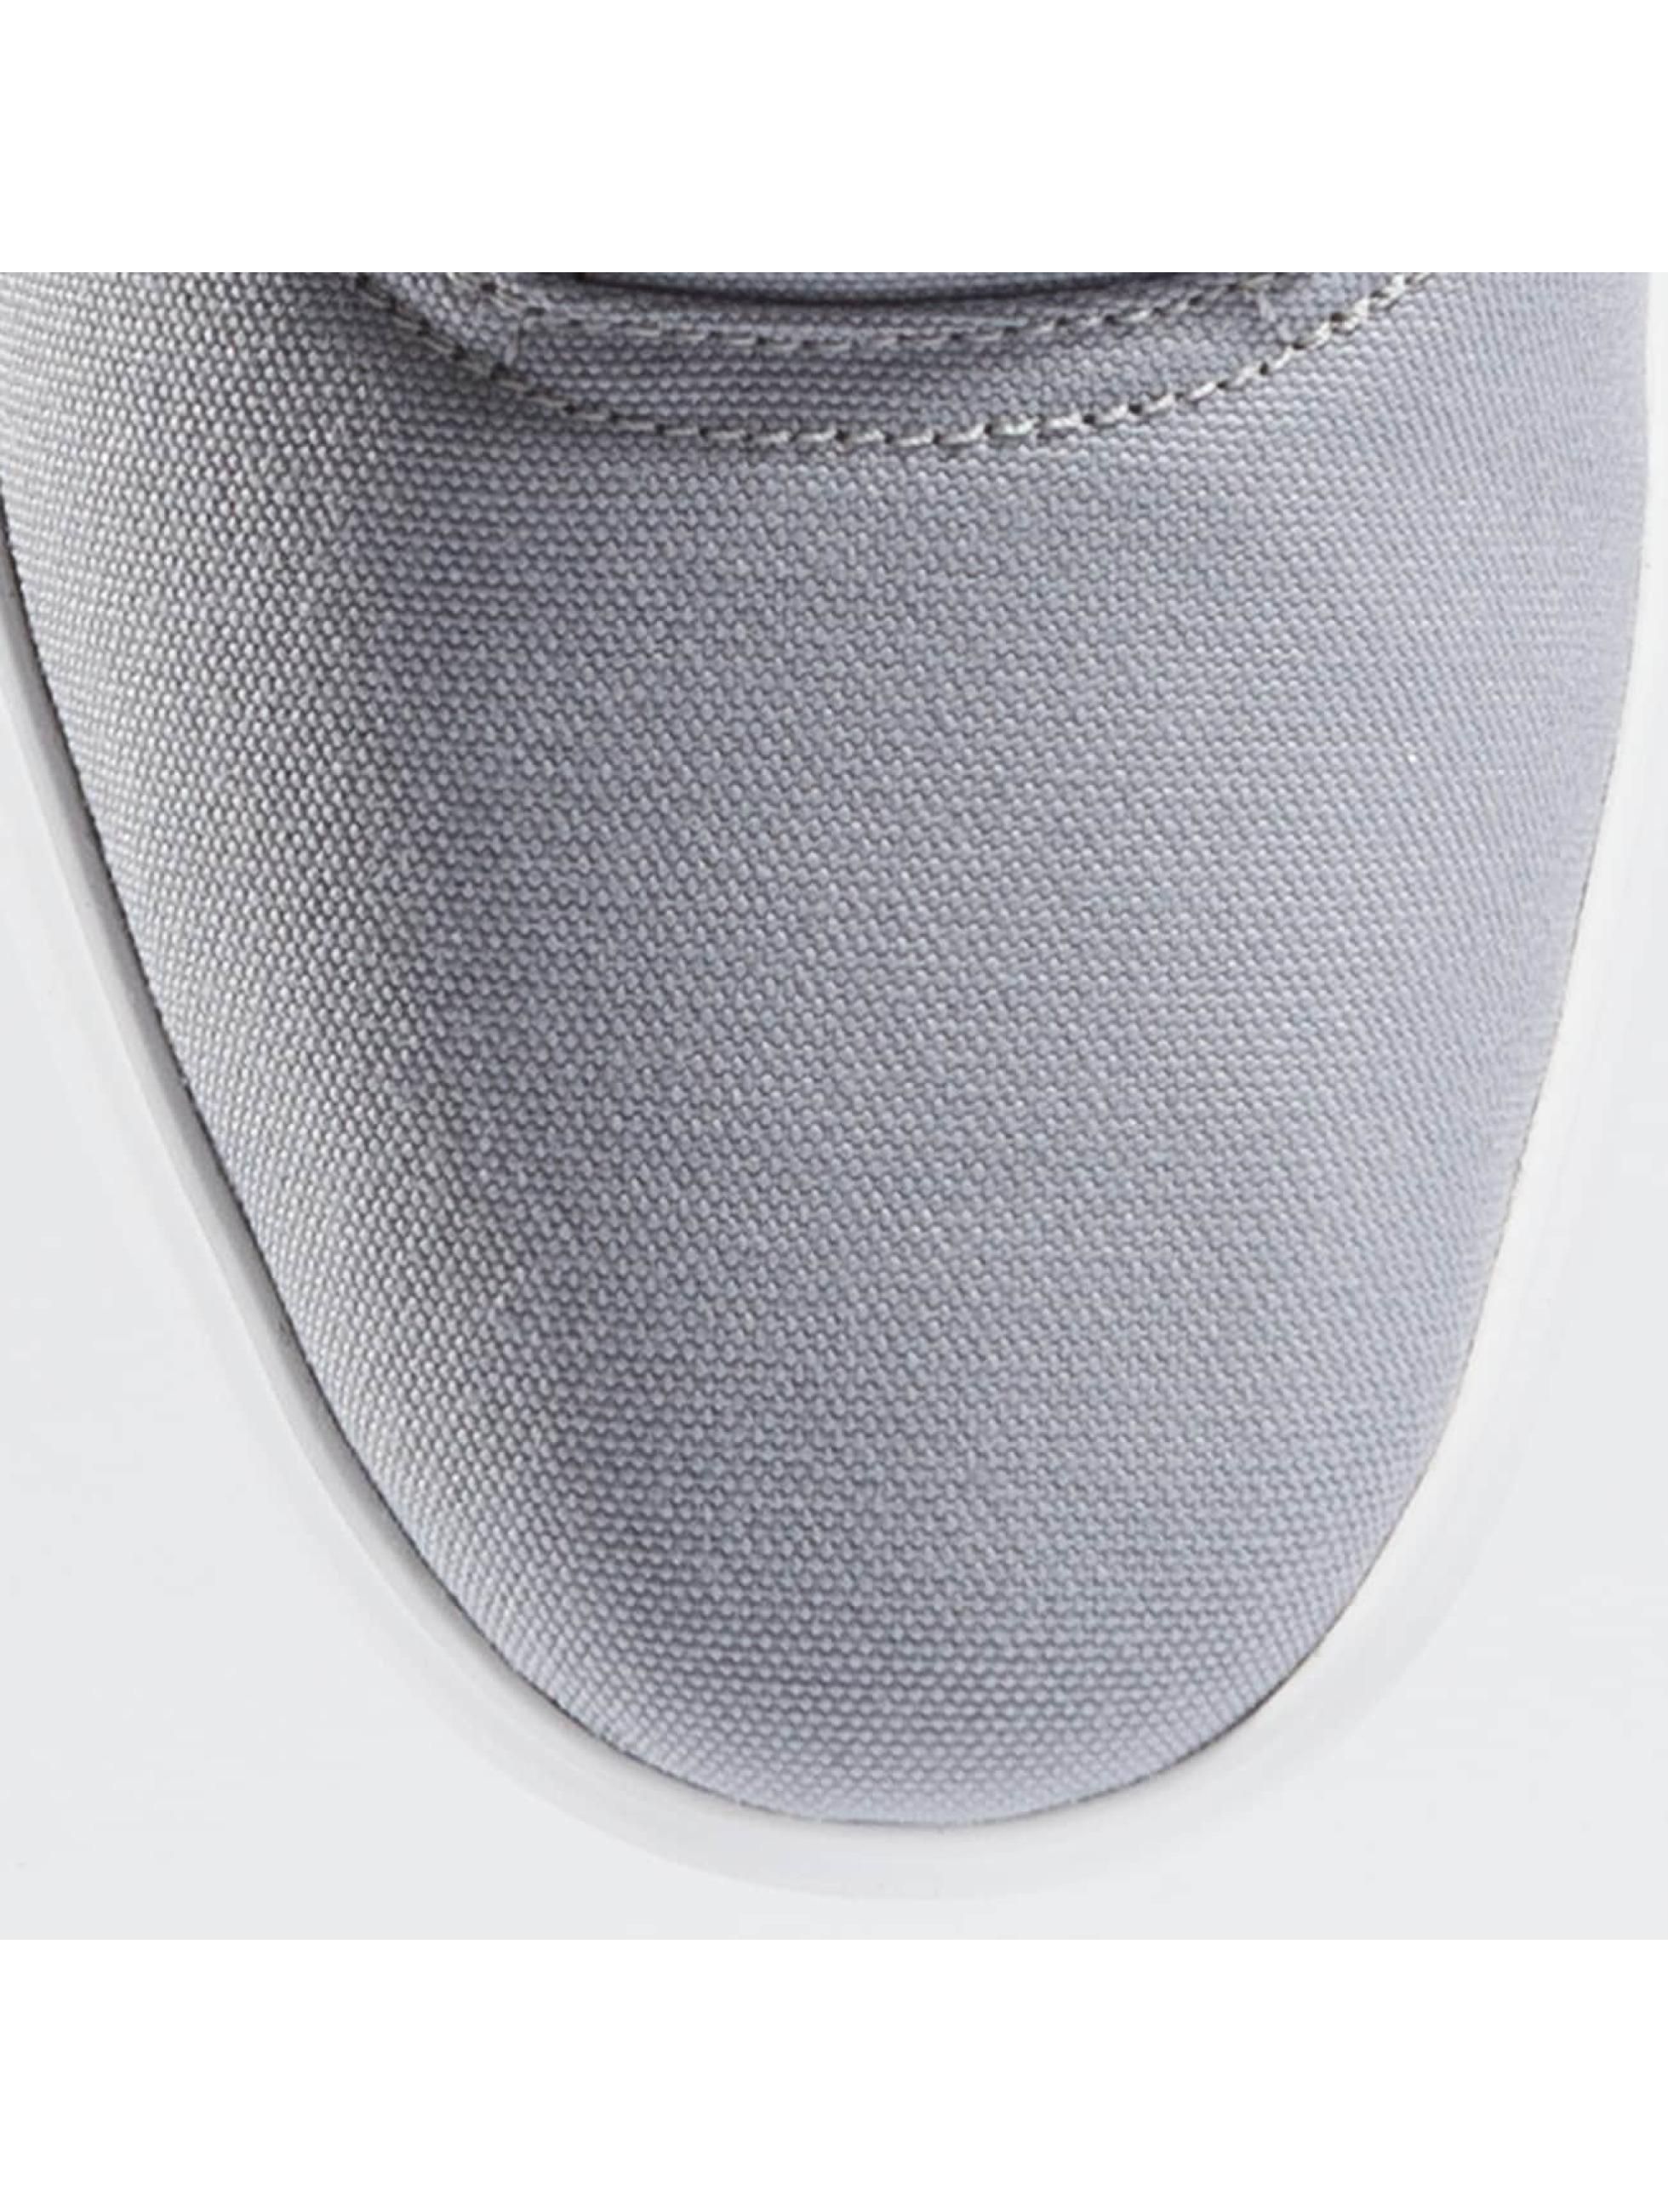 Nike SB Sneaker Check Canvas grigio